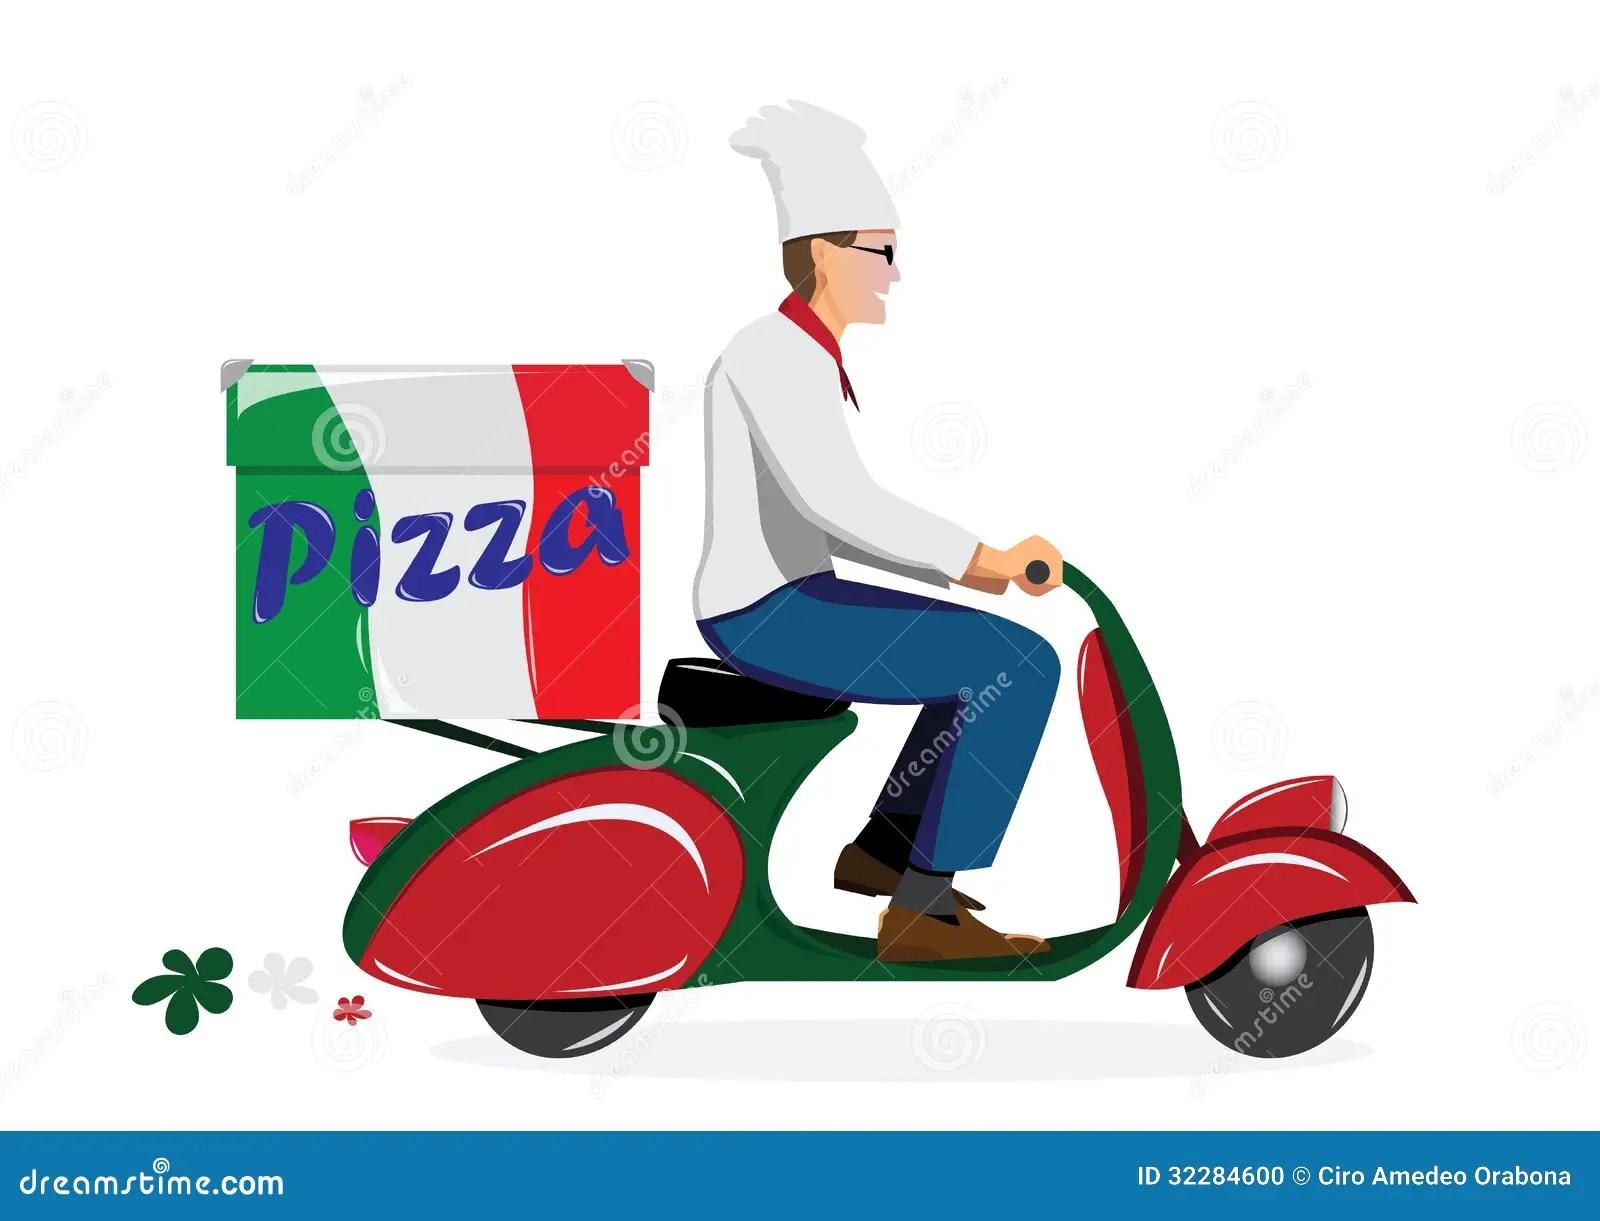 Moto Wallpaper 3d Deliver Pizza Stock Photo Image 32284600